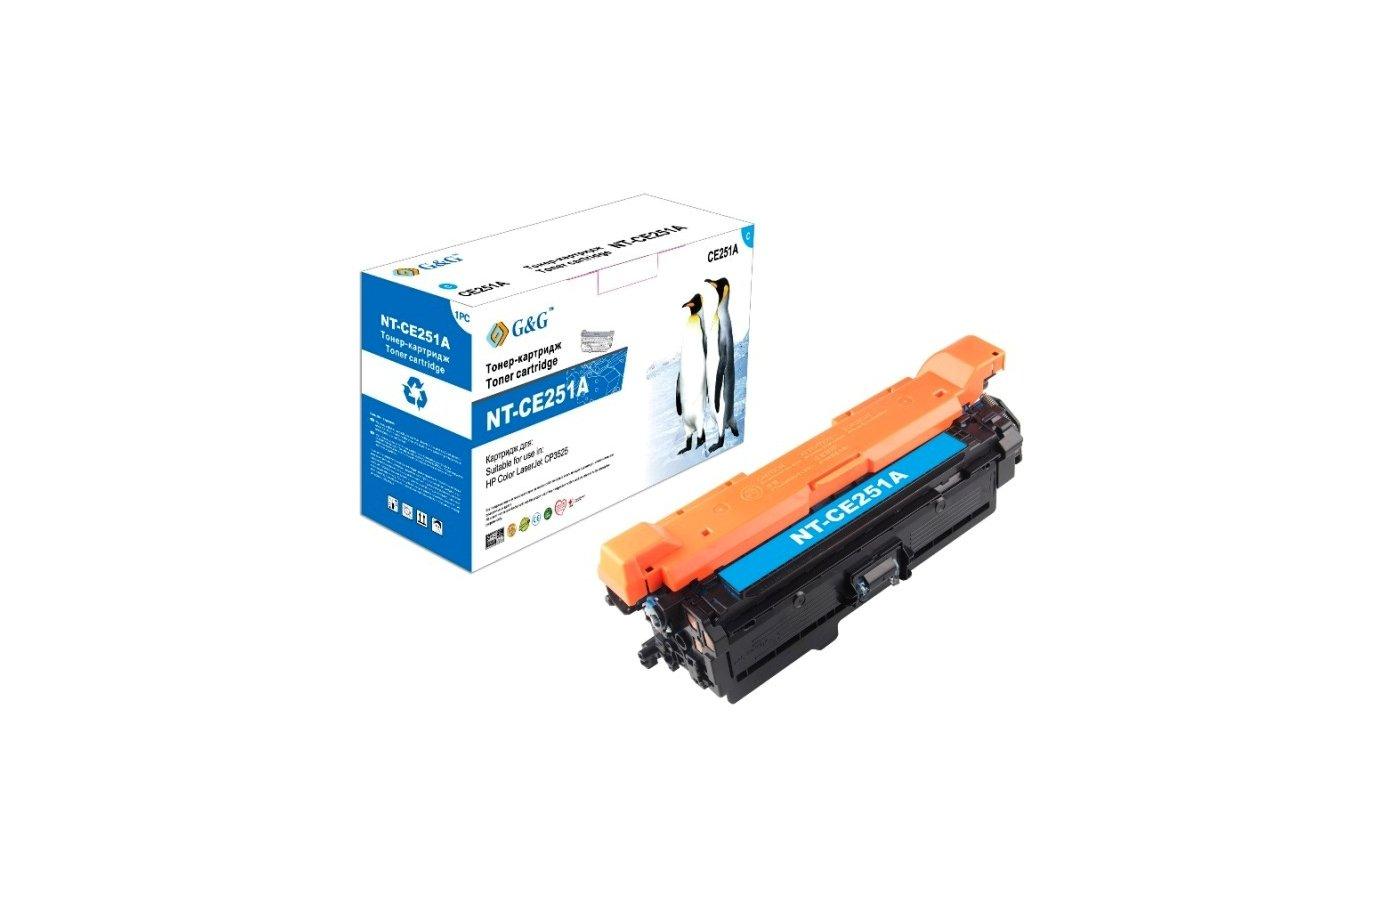 Картридж лазерный GG NT-CE251A Совместимый голубой для HP LaserJet CP3525 (8000стр)